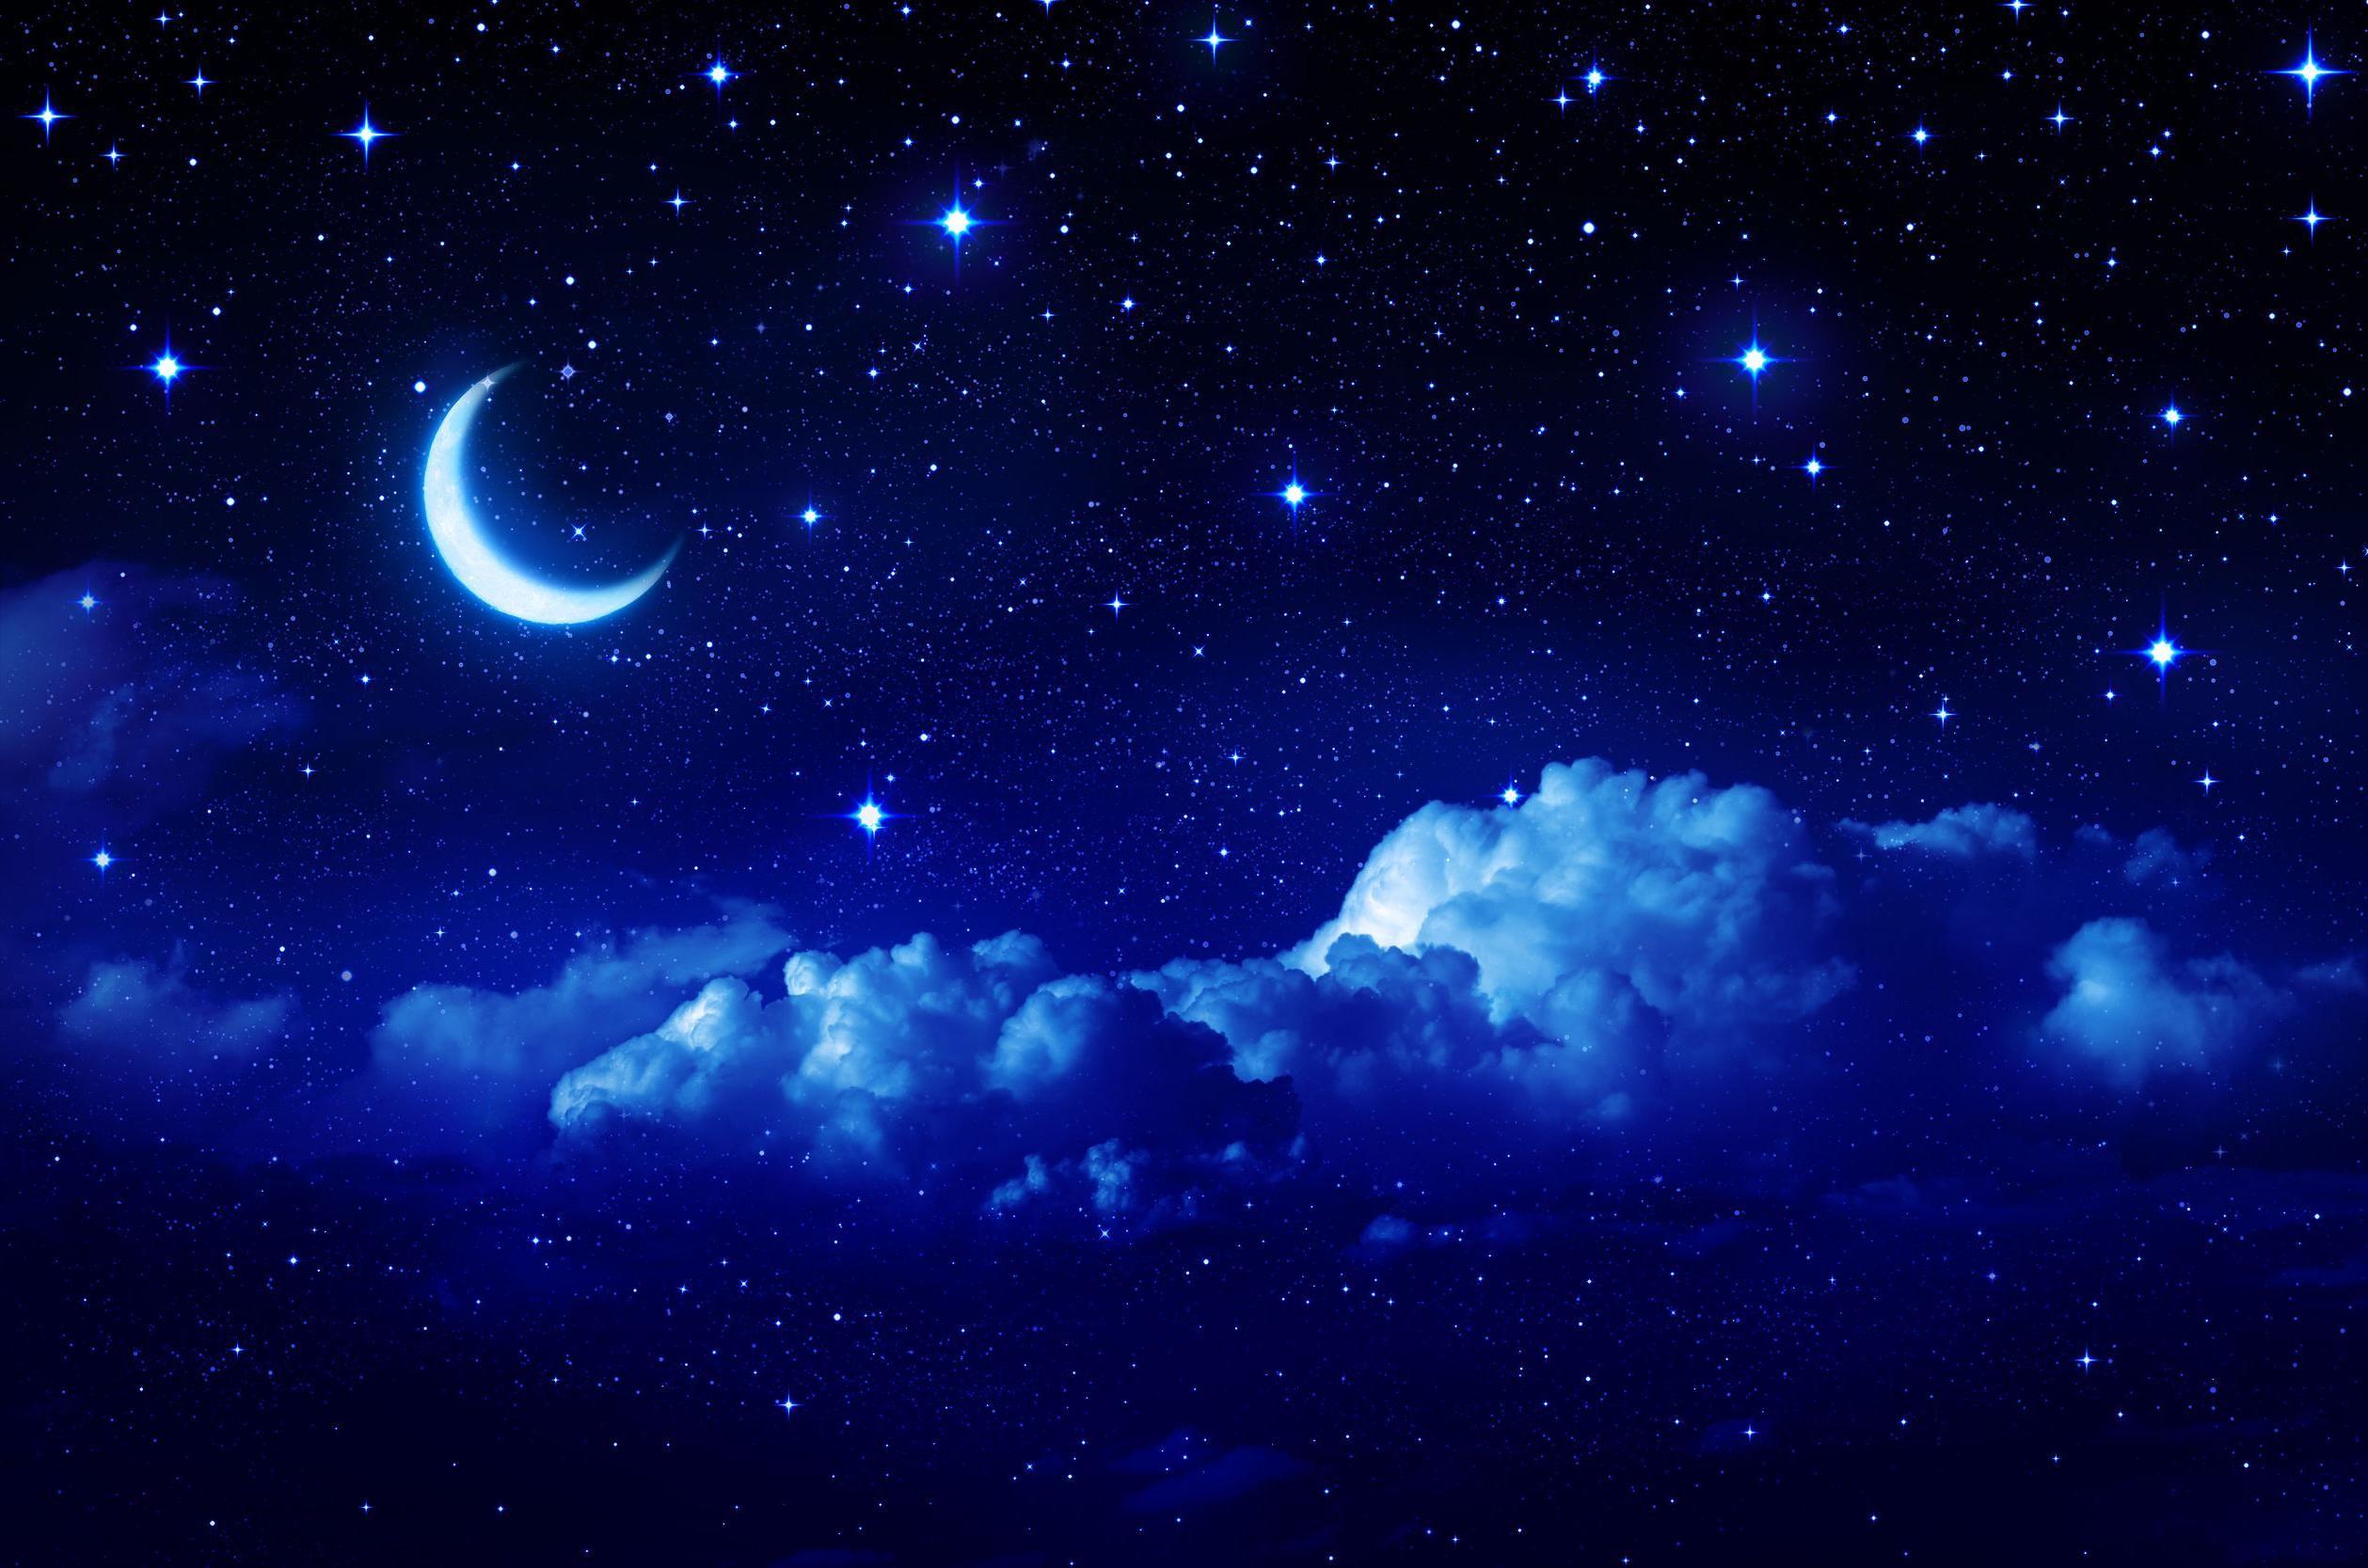 Blue Night Sky Wallpaper Night Sky Wallpaper Night Sky Photography Sky Photography